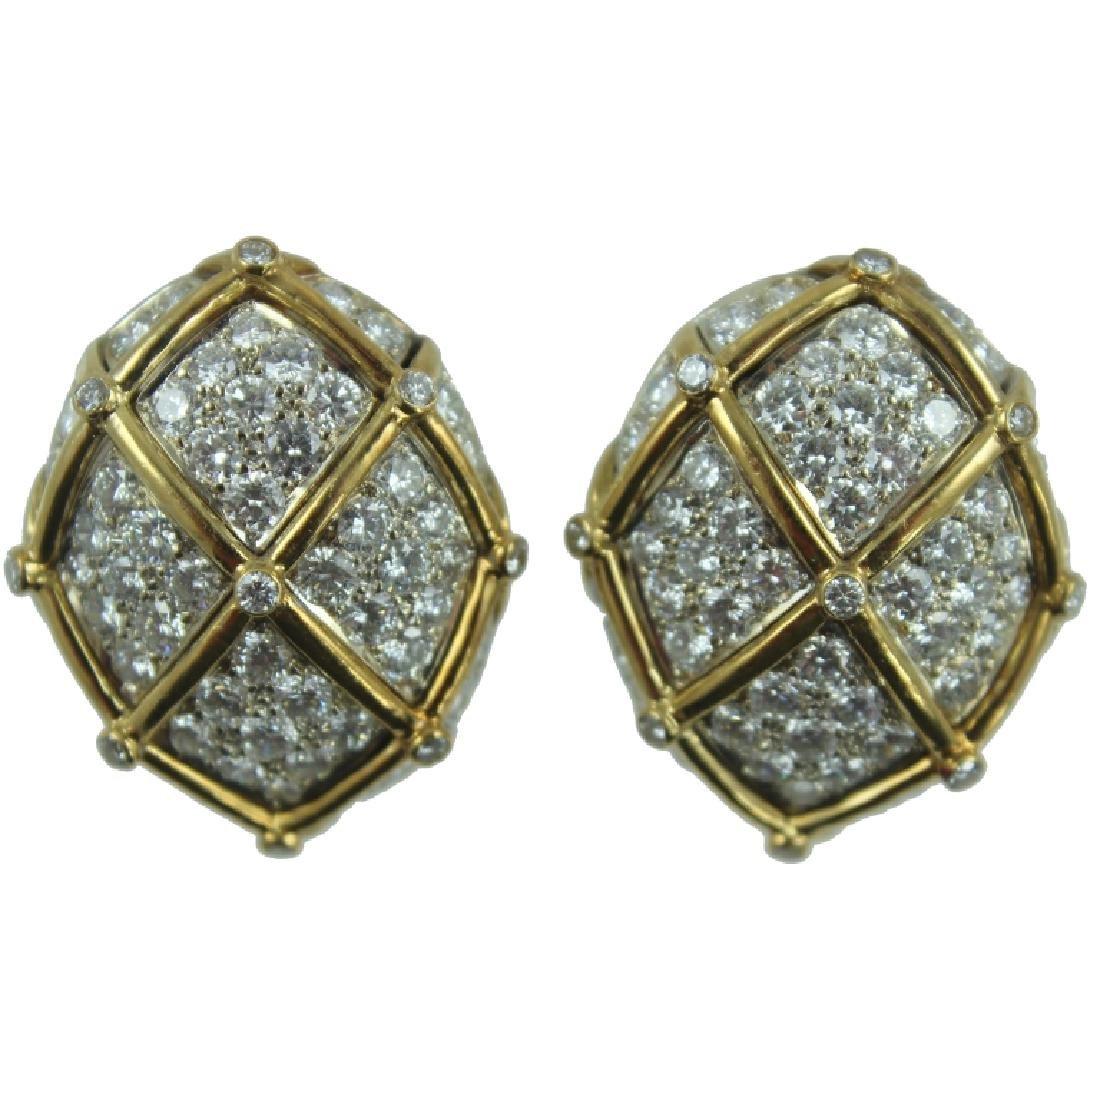 18K PAIR OF CAGE DESIGN DIAMOND EARRING